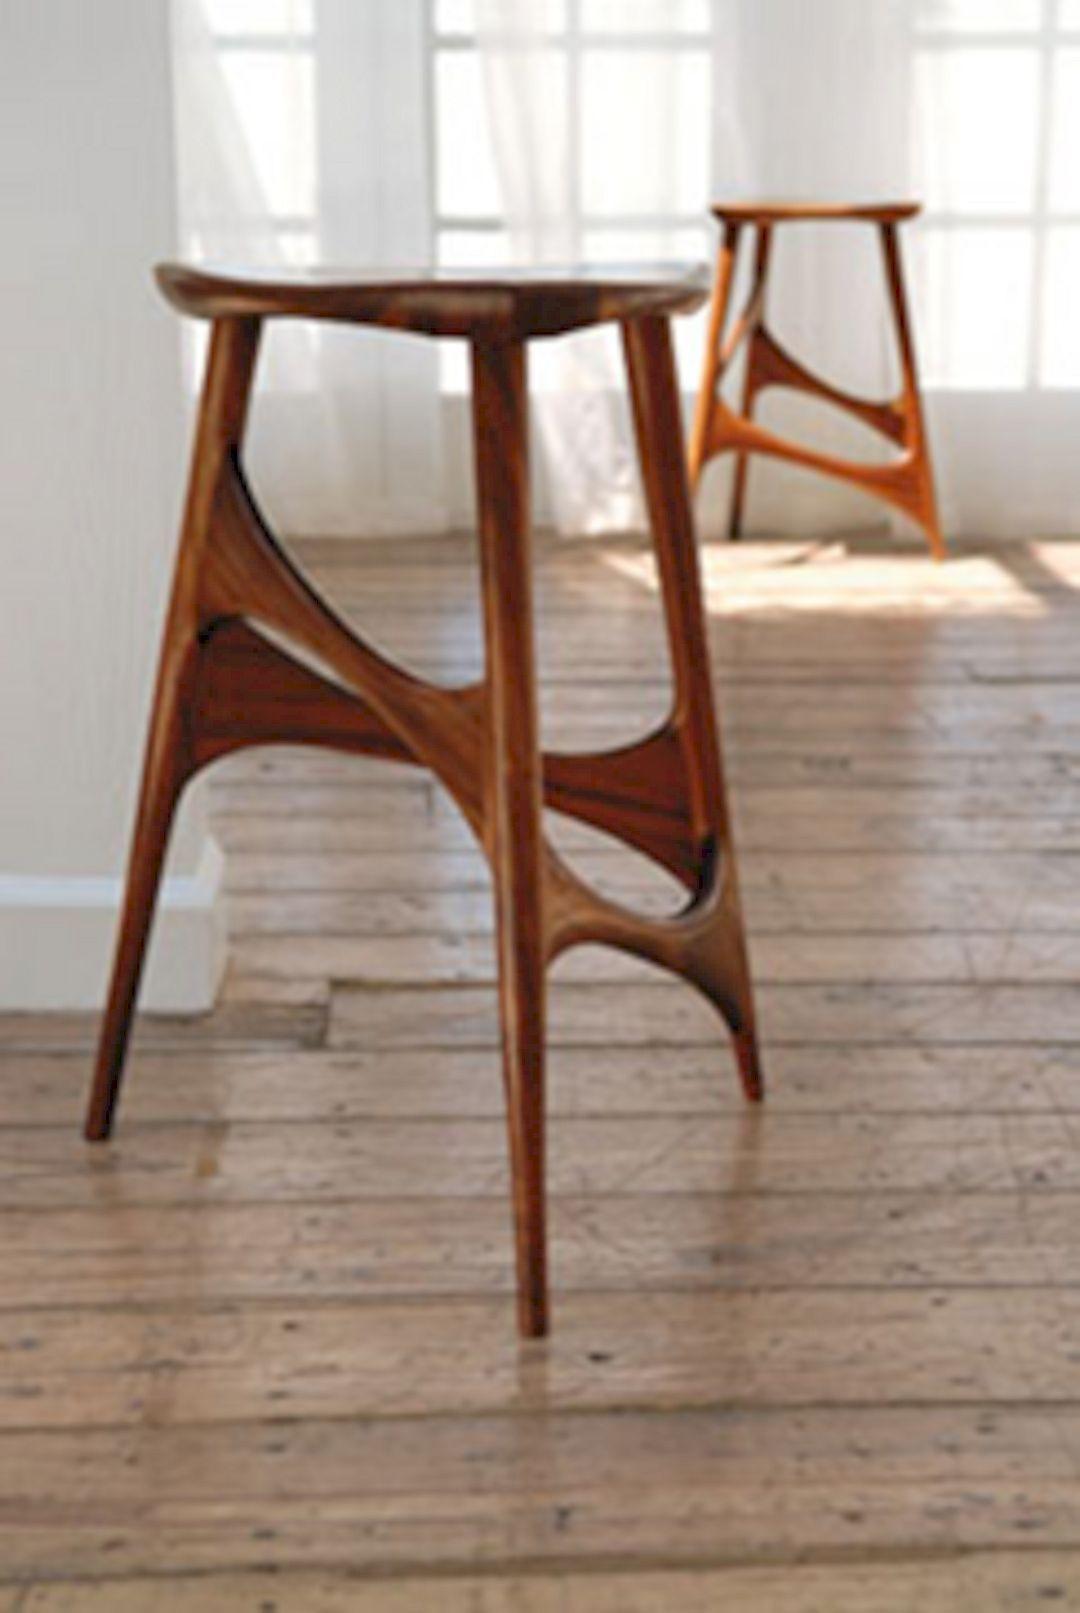 Mcm furniture danish furniture furniture design mid century modern design mid century